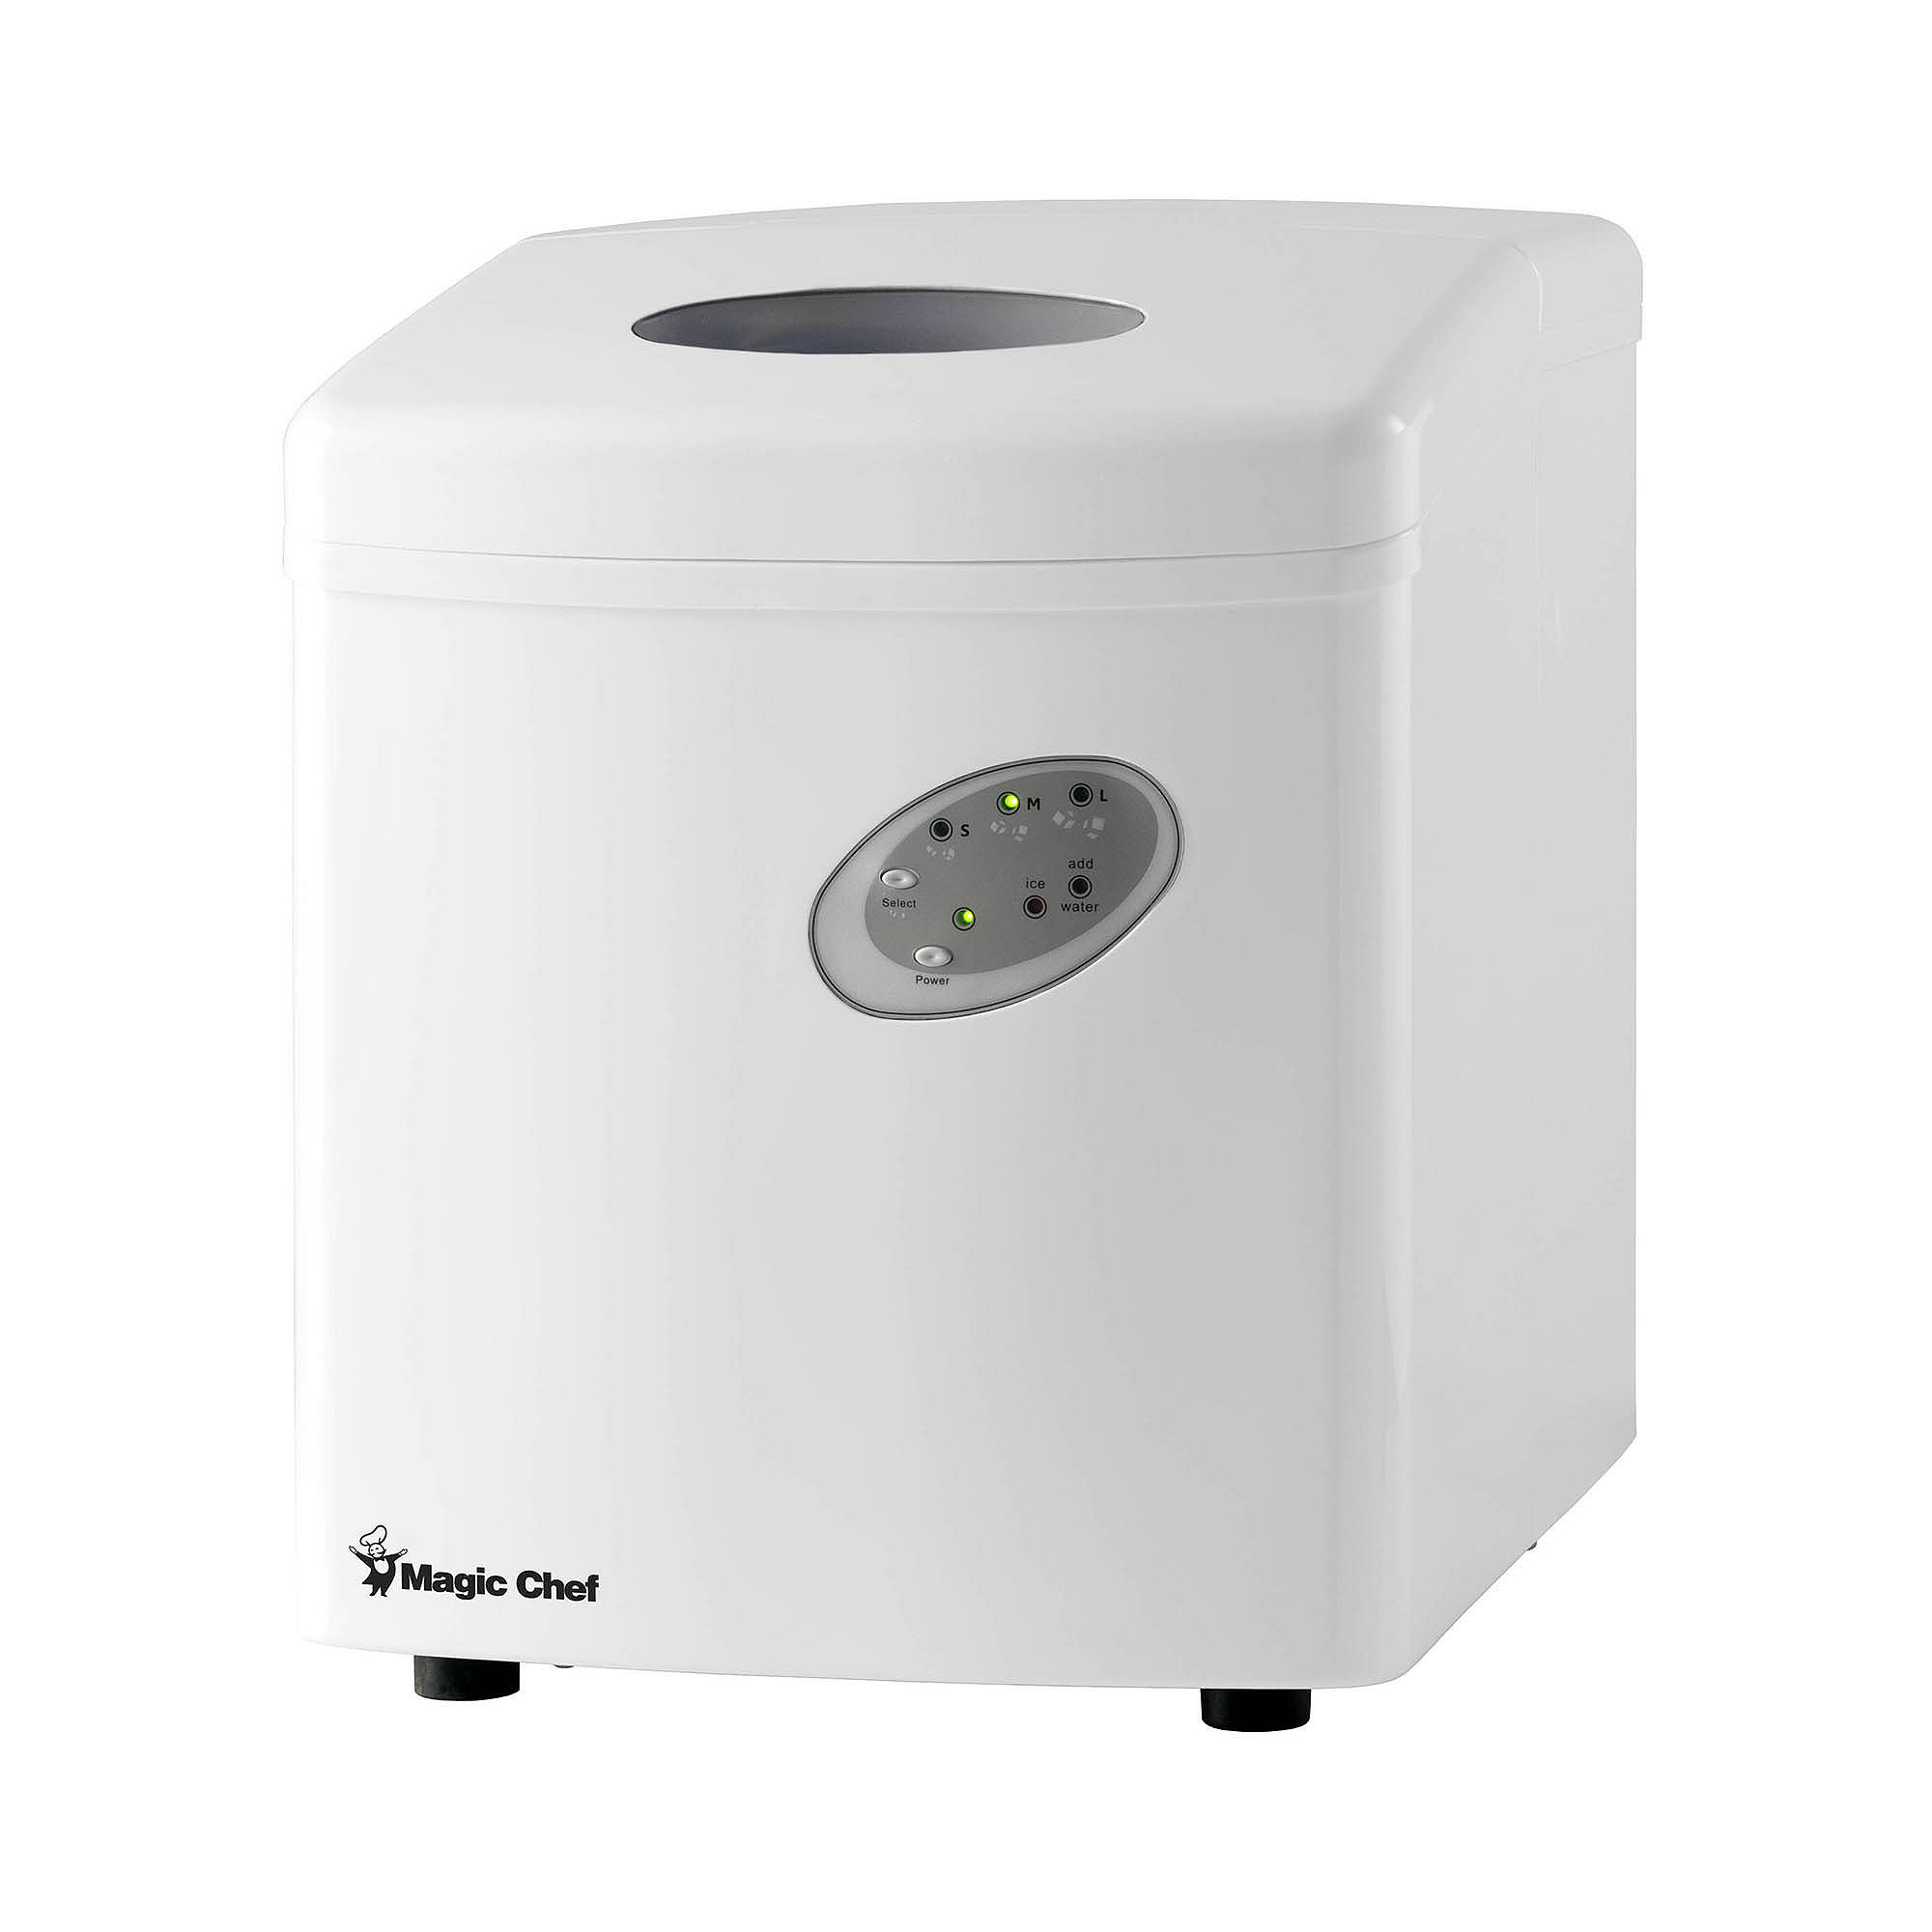 Countertop Ice Machine Target : chef 27 lb countertop ice maker magic chef 27 lb countertop ice maker ...